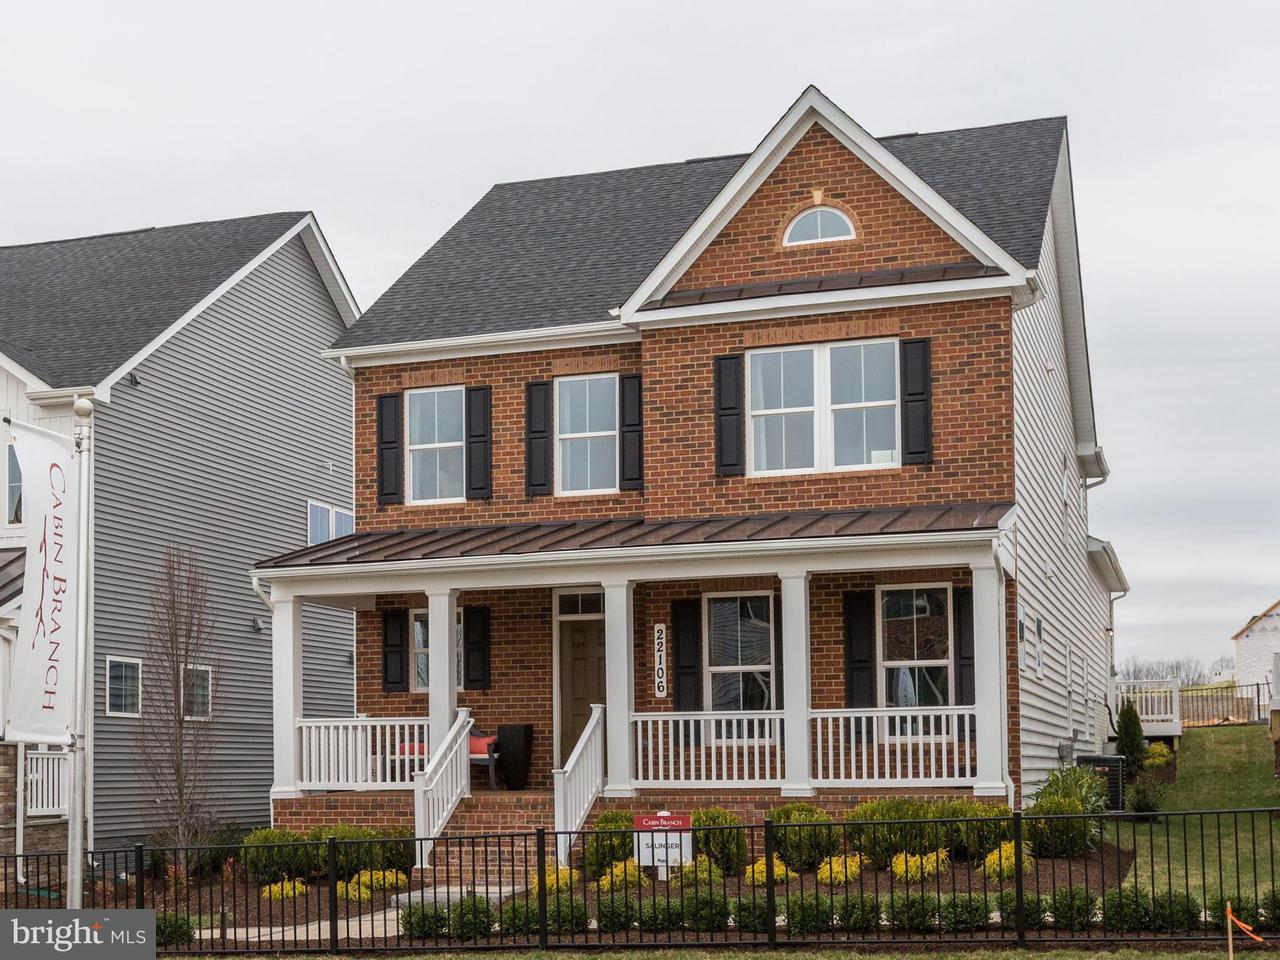 独户住宅 为 销售 在 4306 ARBOR WOOD Court 4306 ARBOR WOOD Court Burtonsville, 马里兰州 20866 美国